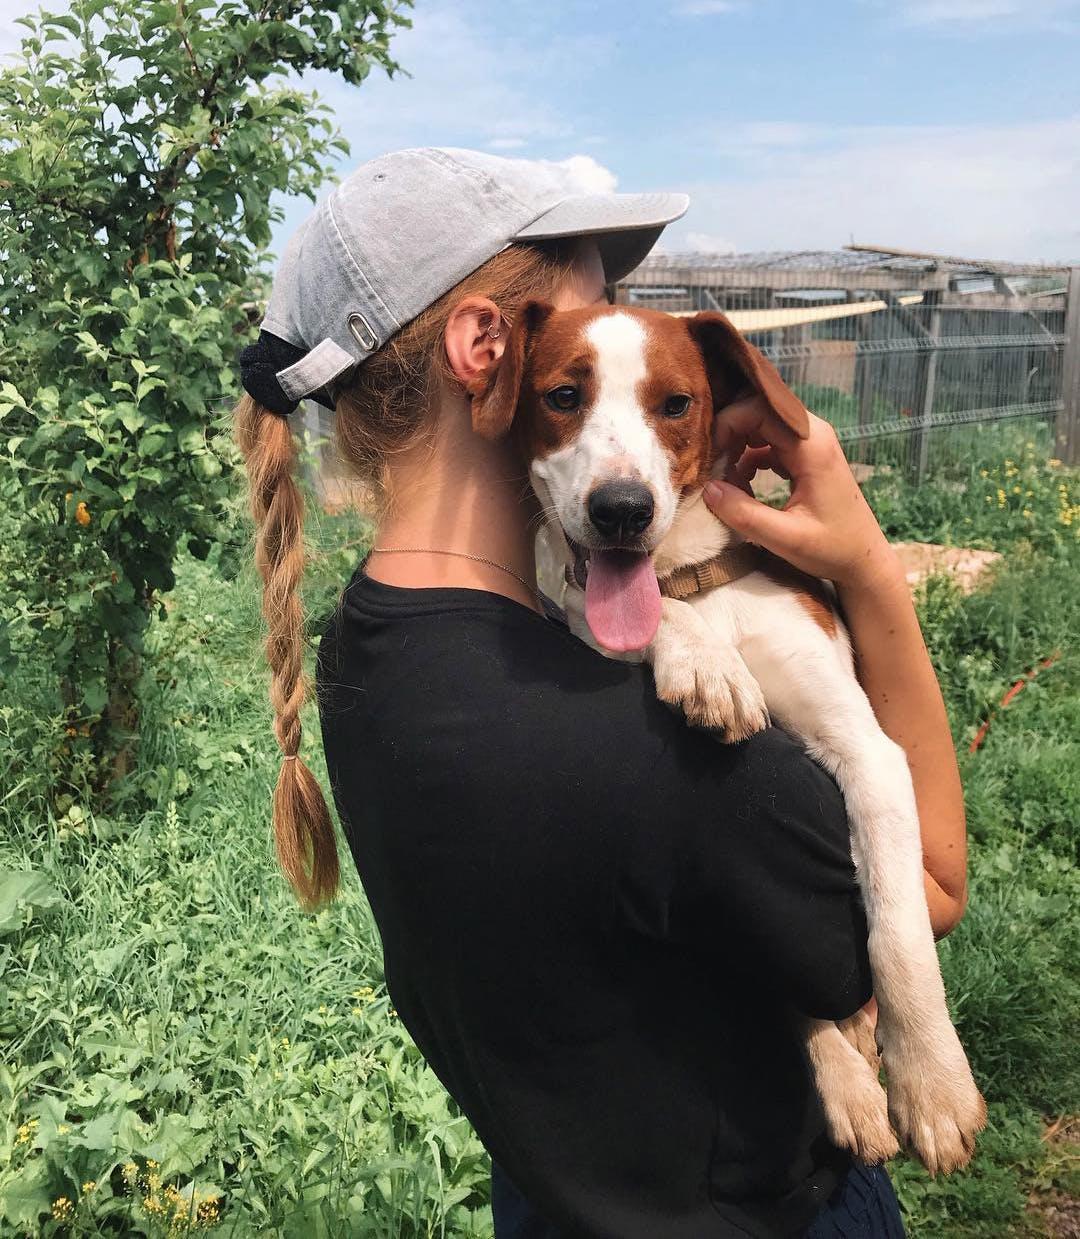 Wildlife & Animal Care Volunteer Abroad Programs